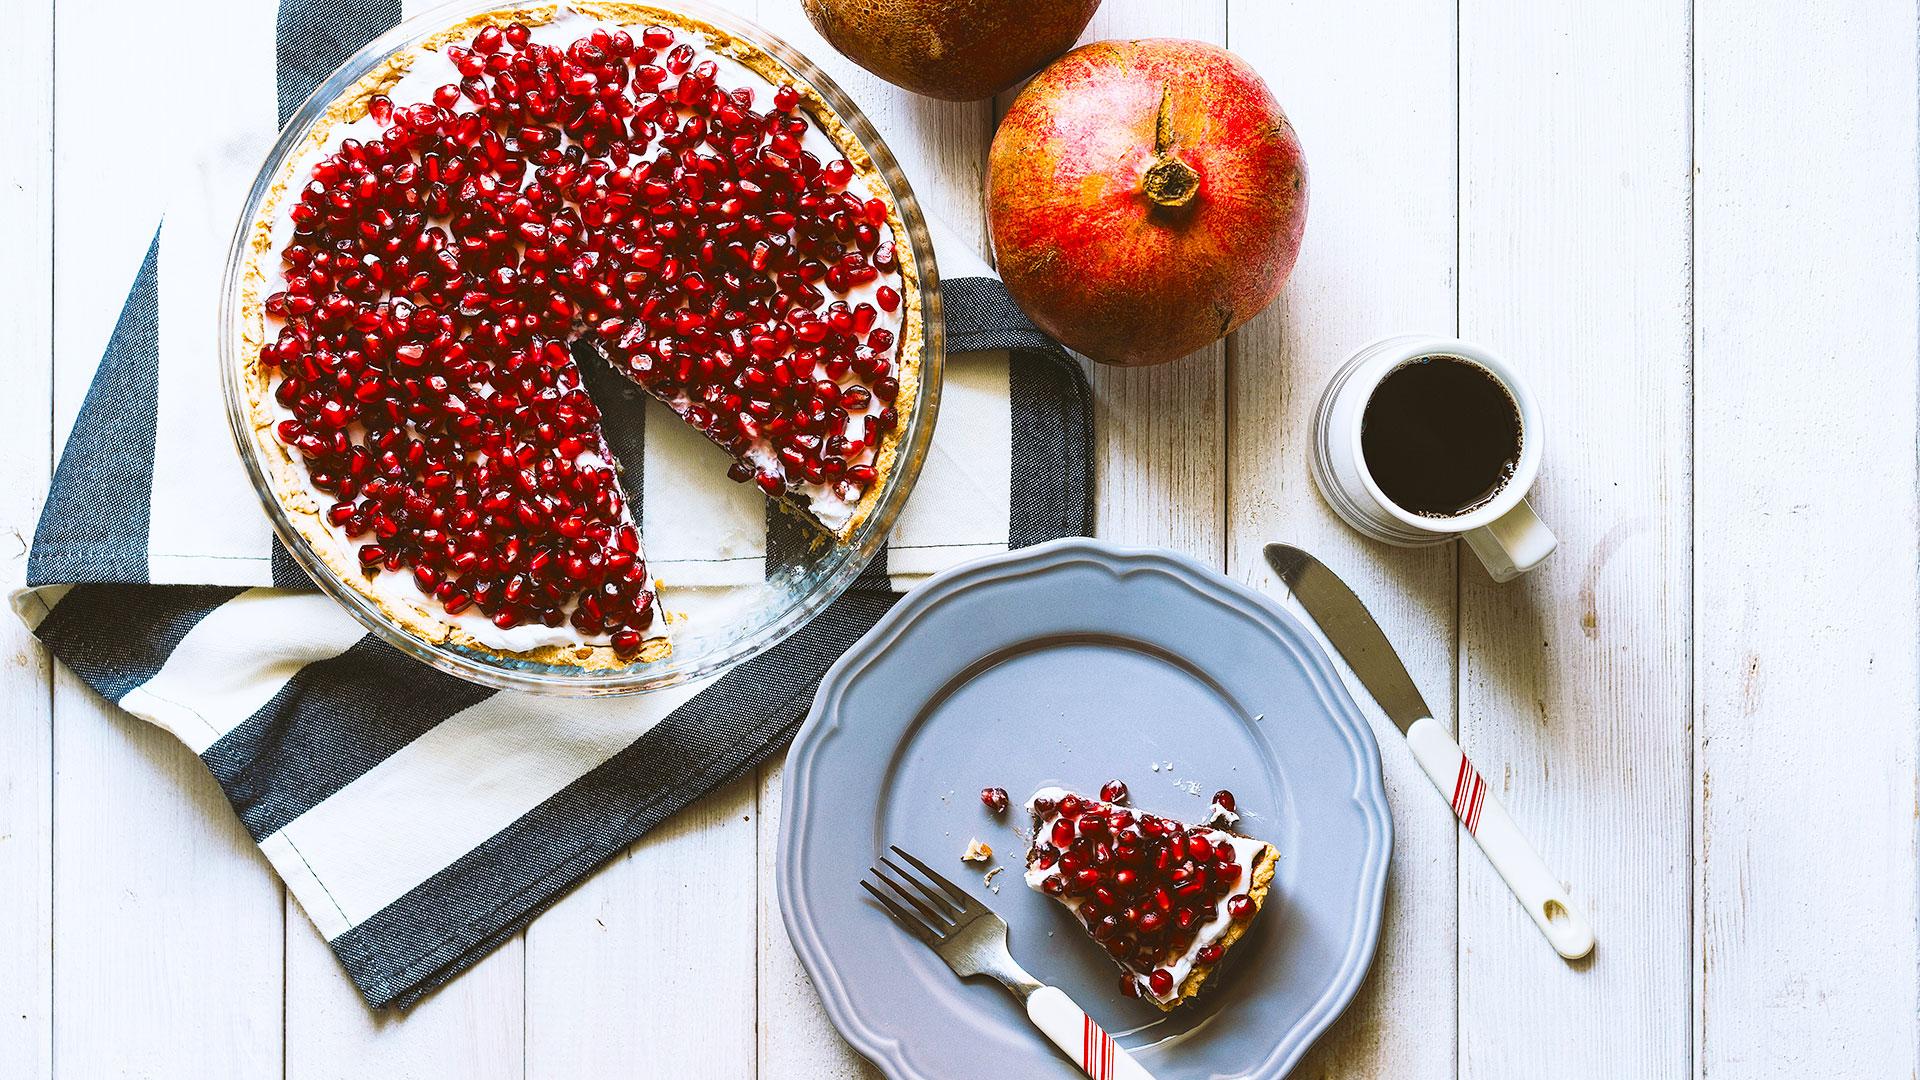 STYLECASTER | Winter Fruit Desserts